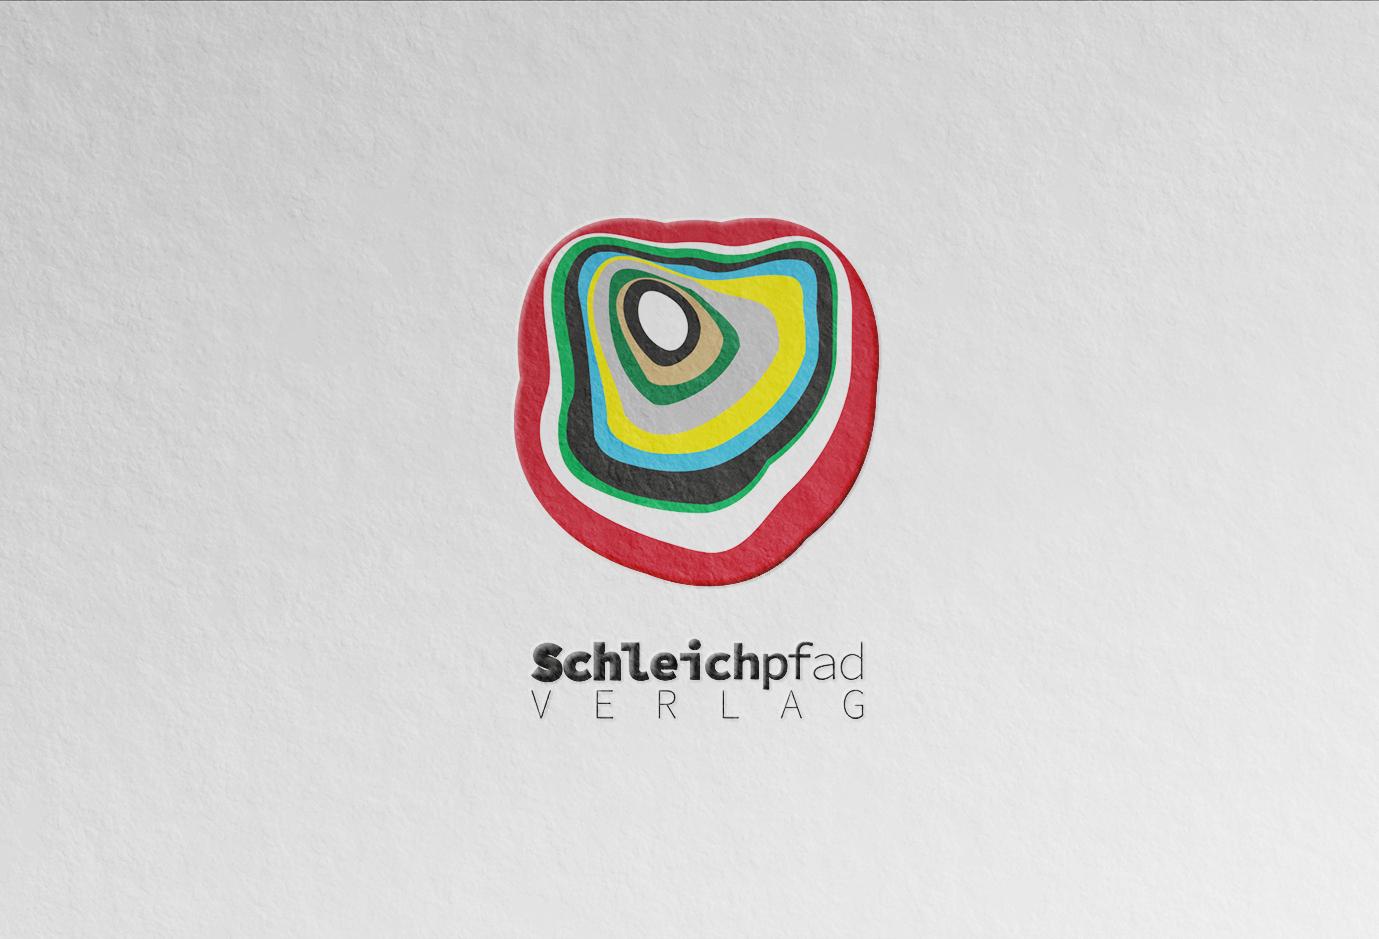 |SchleichPfad|  تلاشی است در پی جوییِ راههای تازه در توافق دادن جوامع.